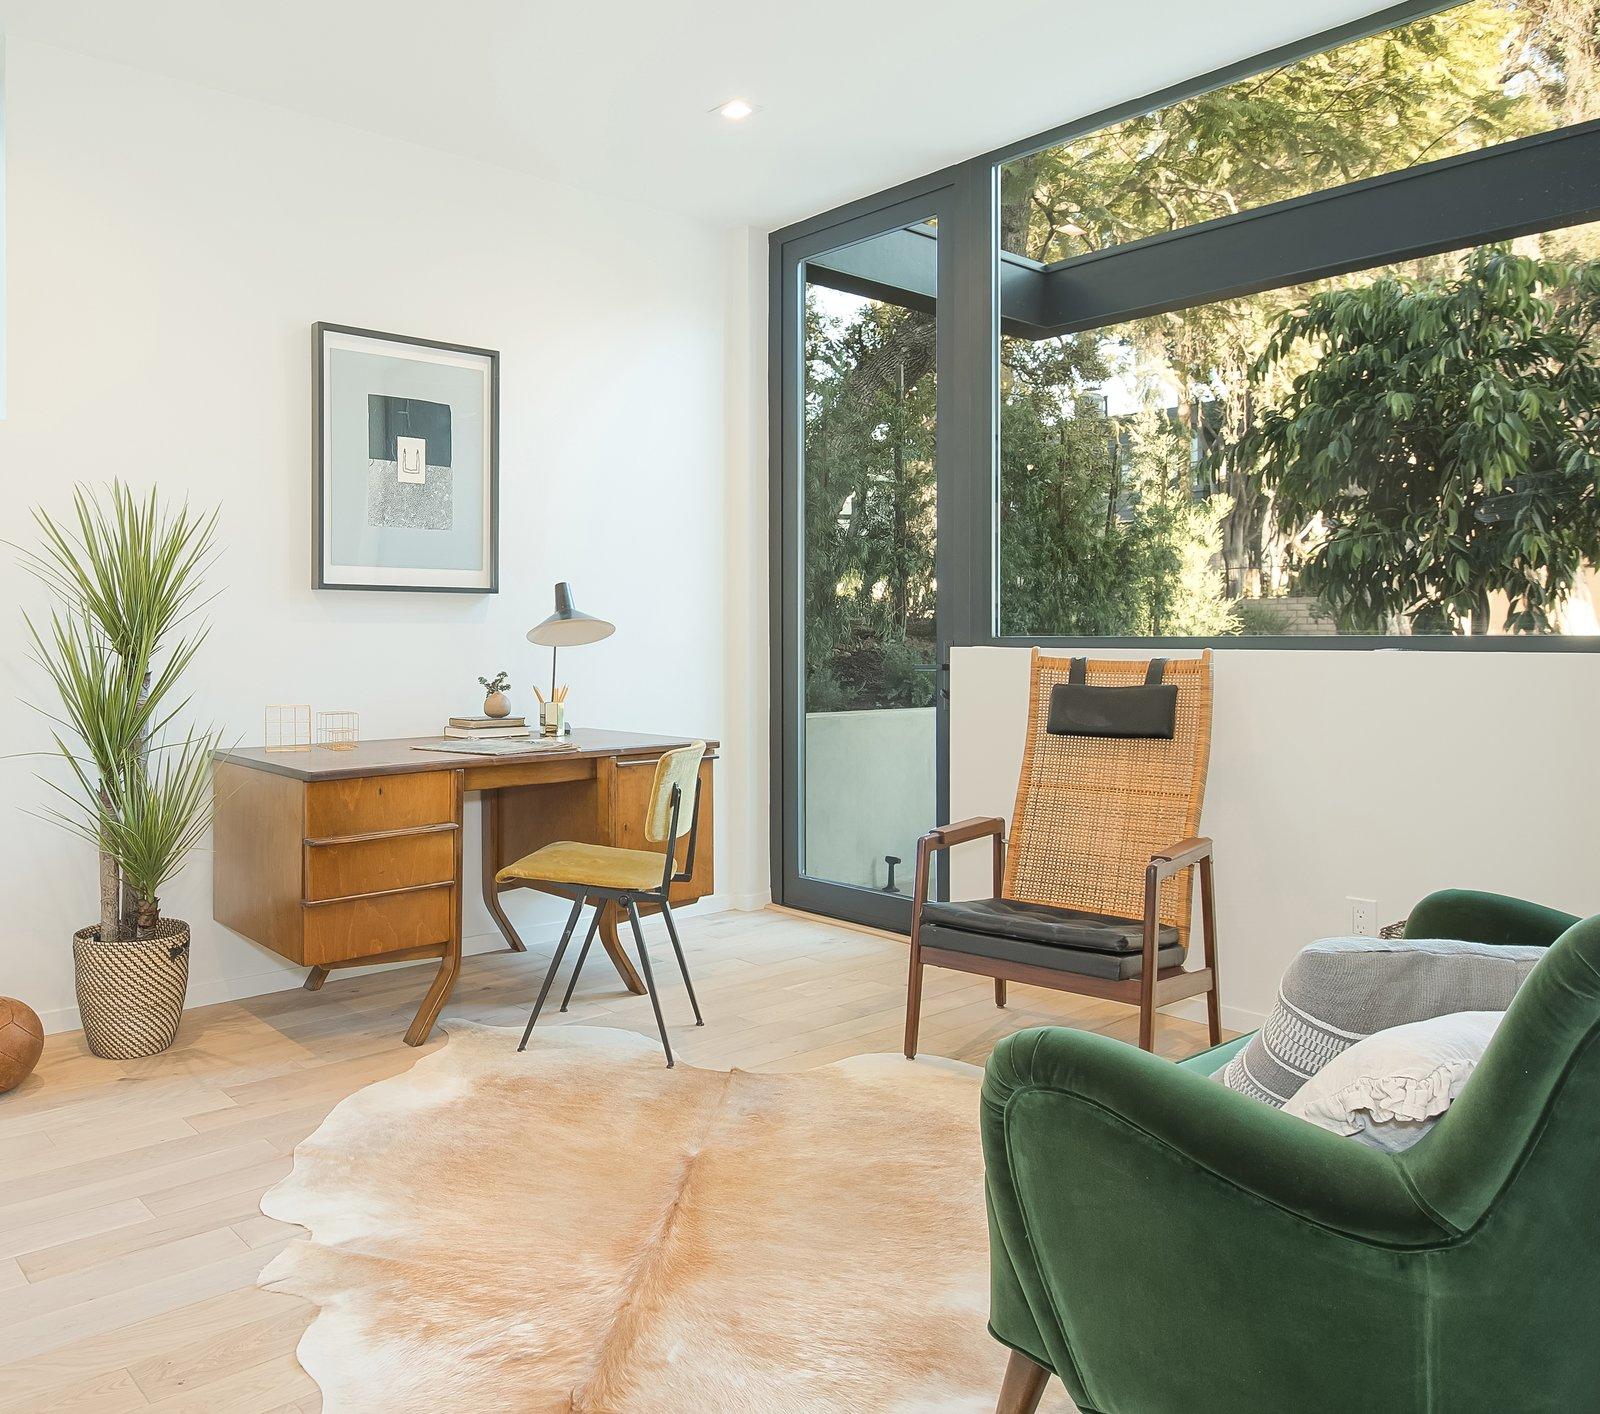 Office, Library Room Type, Medium Hardwood Floor, Chair, and Desk Den  SL House by ANX / Aaron Neubert Architects